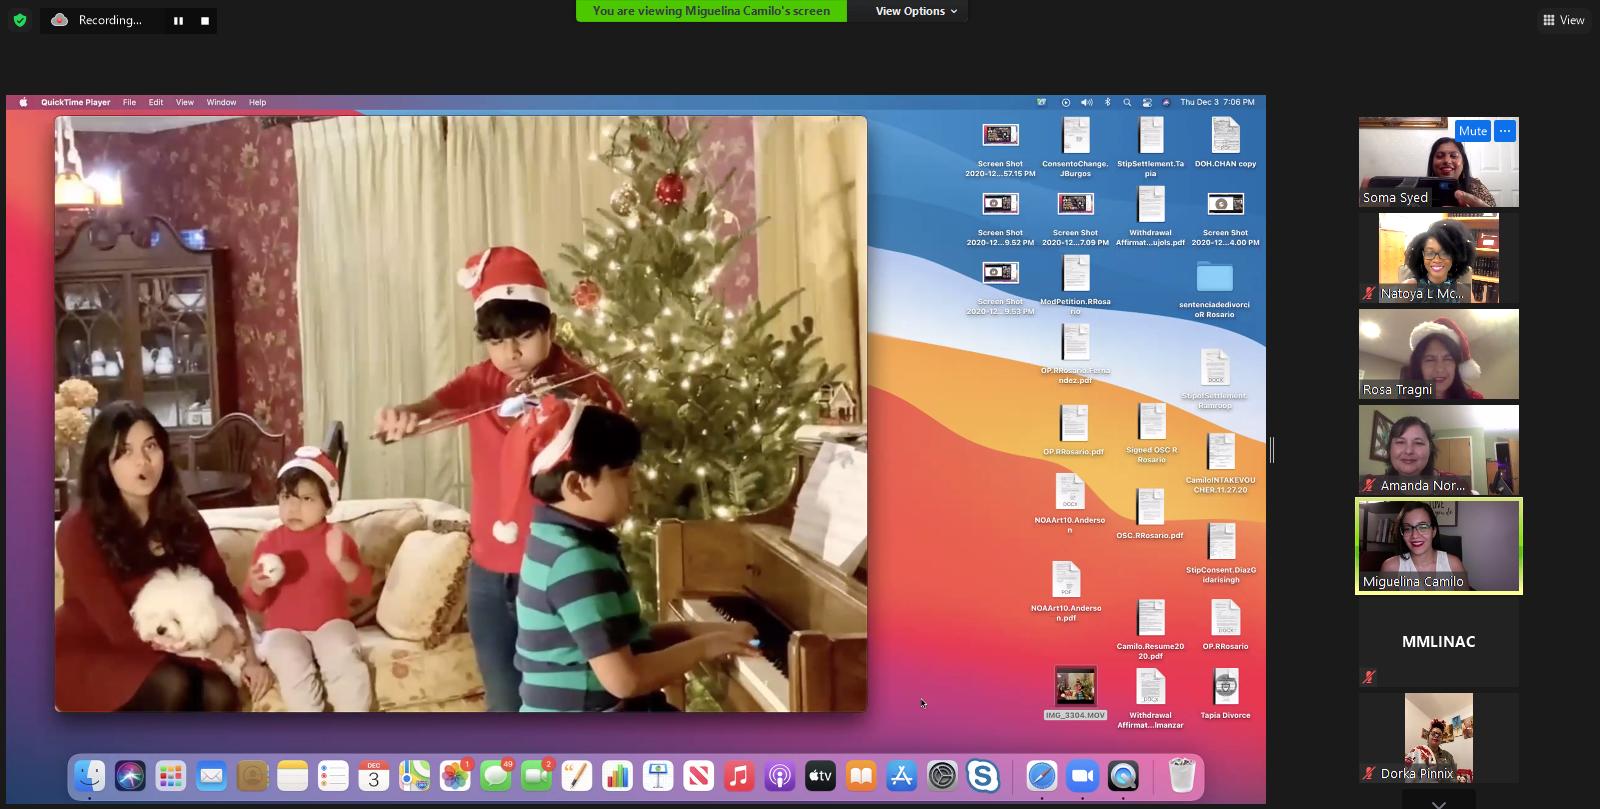 Screenshot (409)